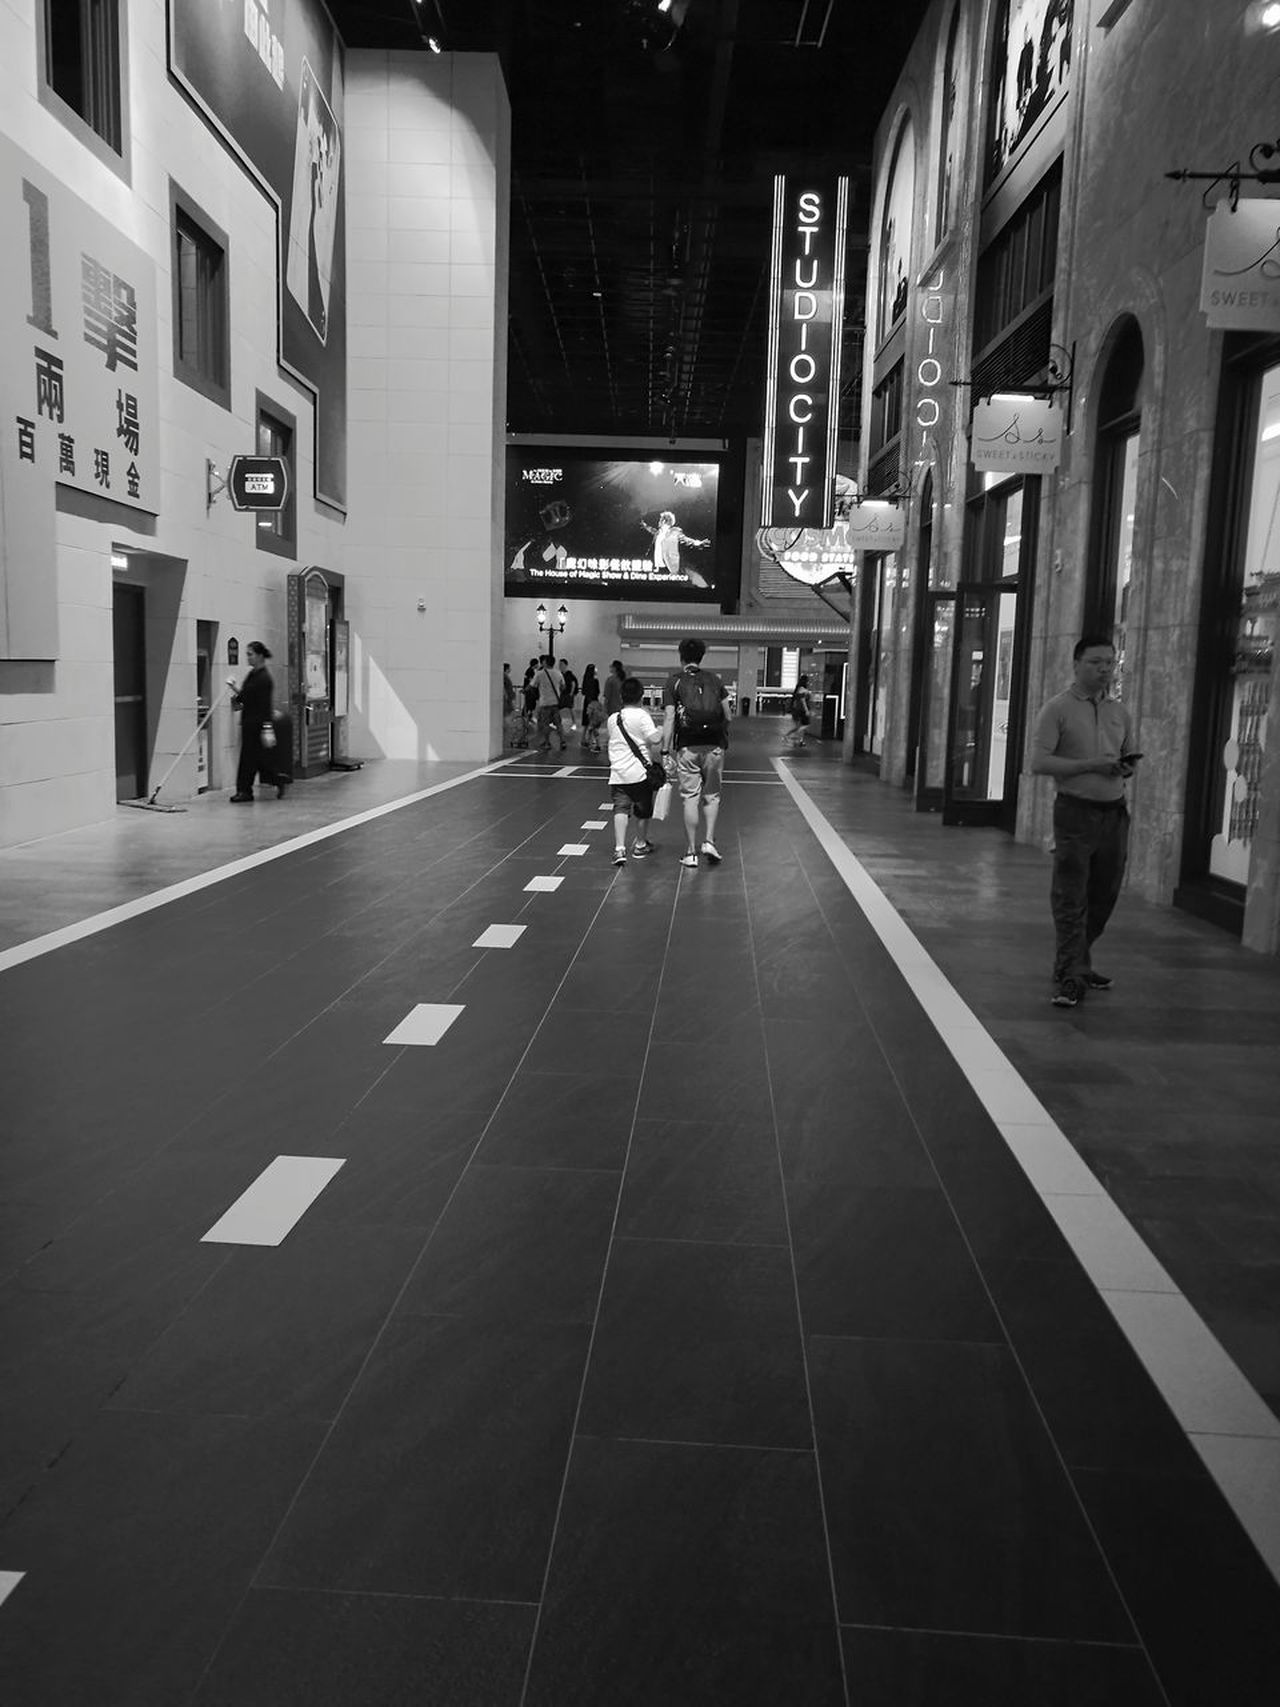 Neighborhood Map People Real People Architecture Indoors  Hotels And Resorts Macau, China Casino Shopping ♡ Vacation Destination Leisure Black & White The Architect - 2017 EyeEm Awards